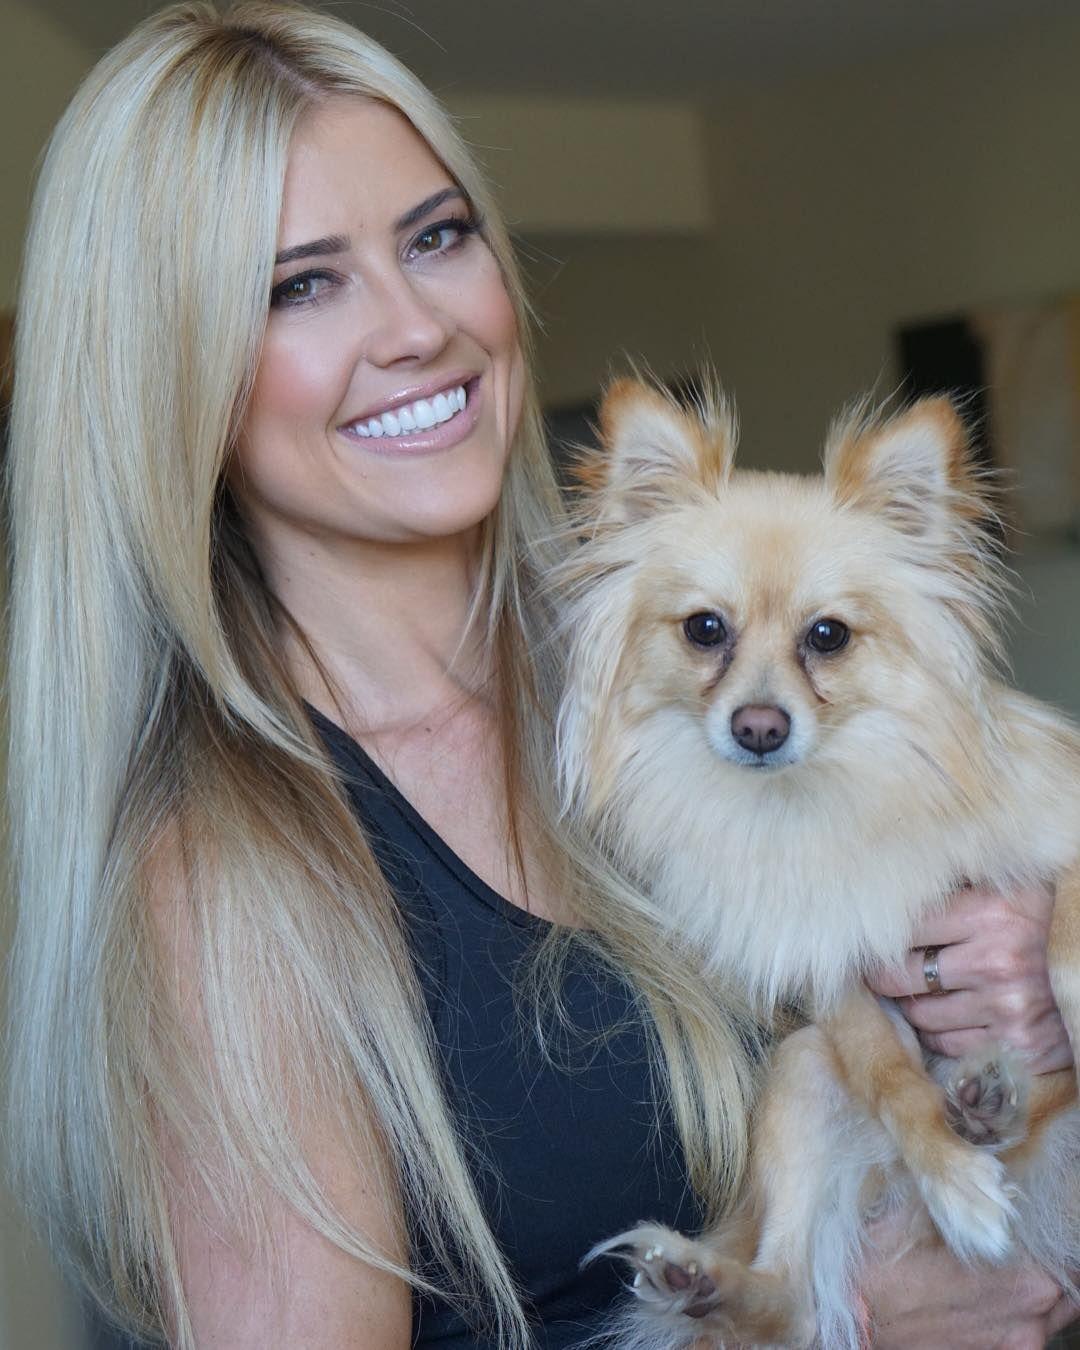 Flip or flopu star christina el moussa officially files for divorce